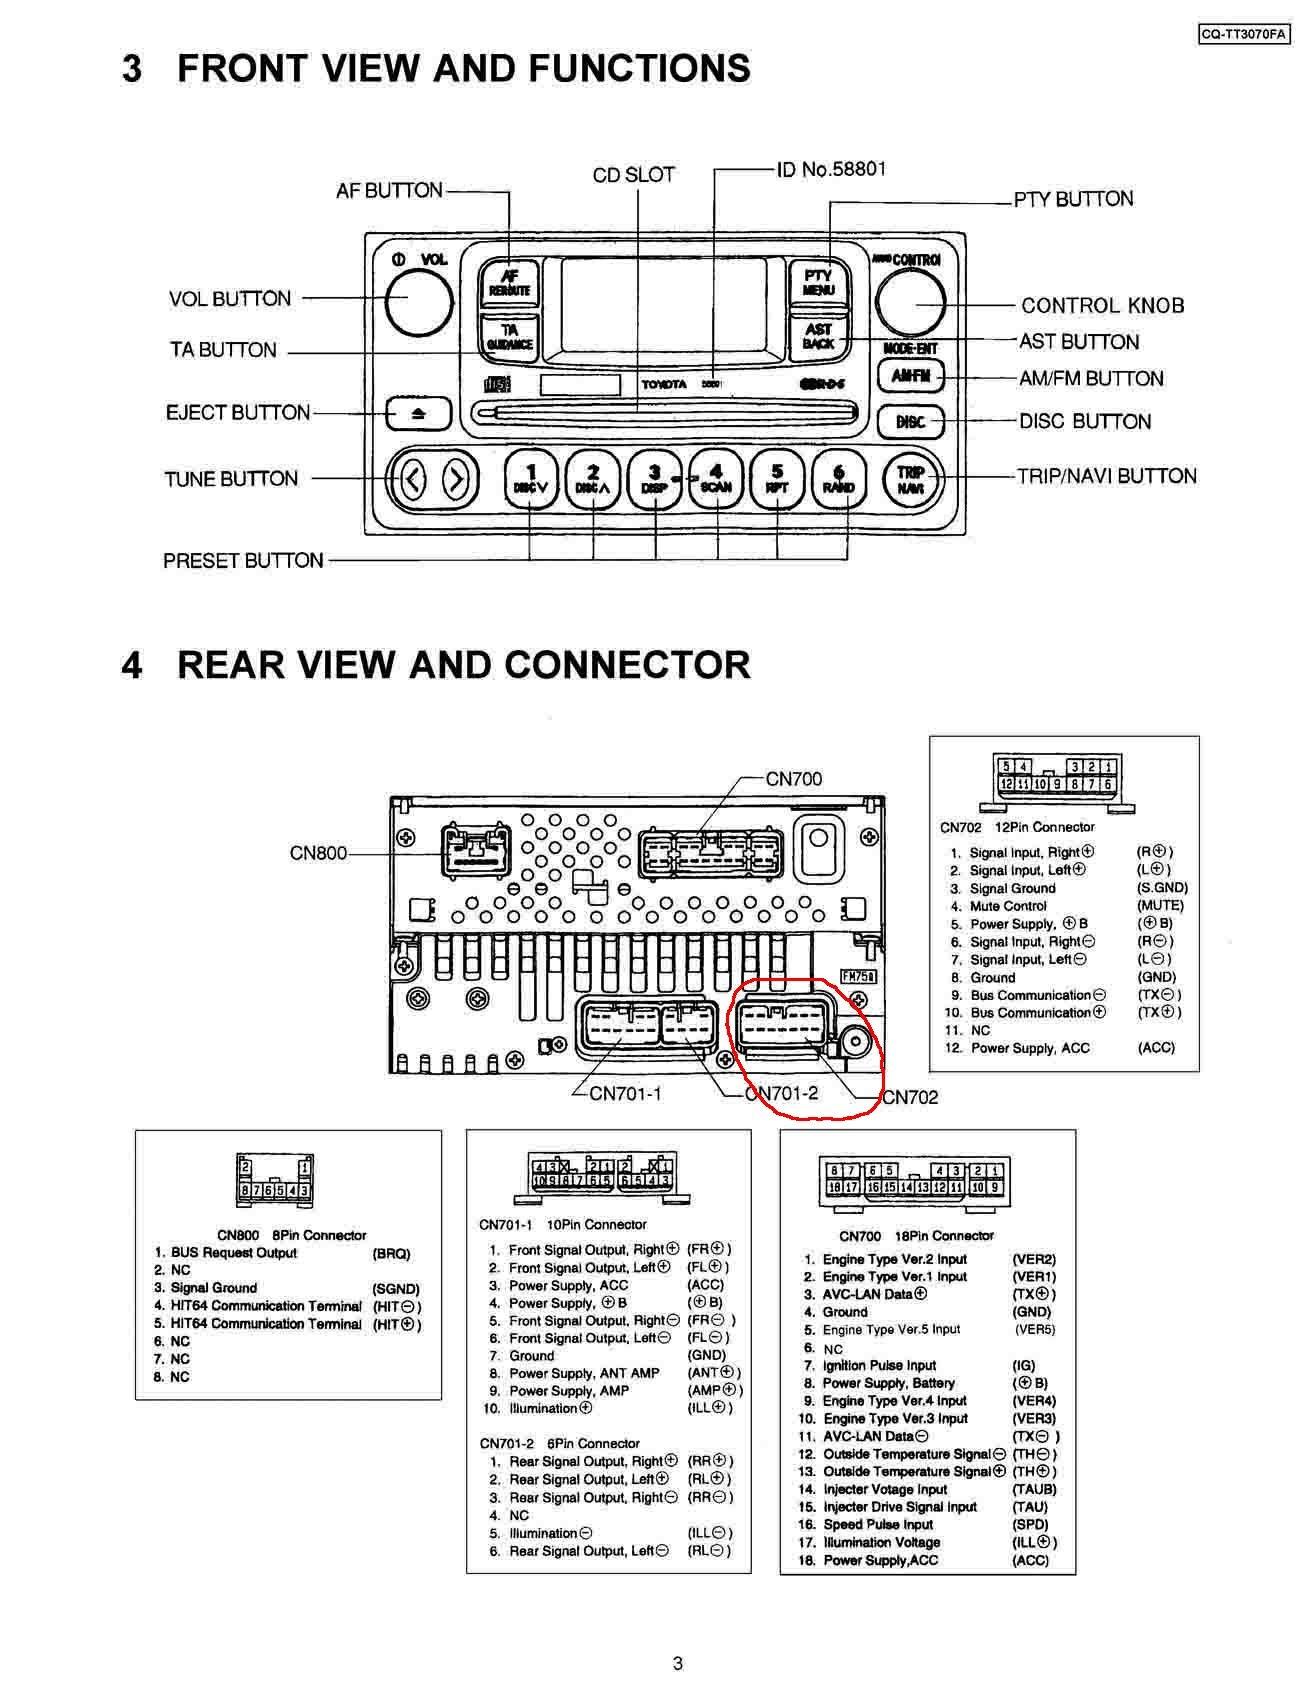 toyota fujitsu ten 86120 wiring diagram 2006 silverado bose radio mp3 в штатную магнитолу  бортжурнал rav4 black